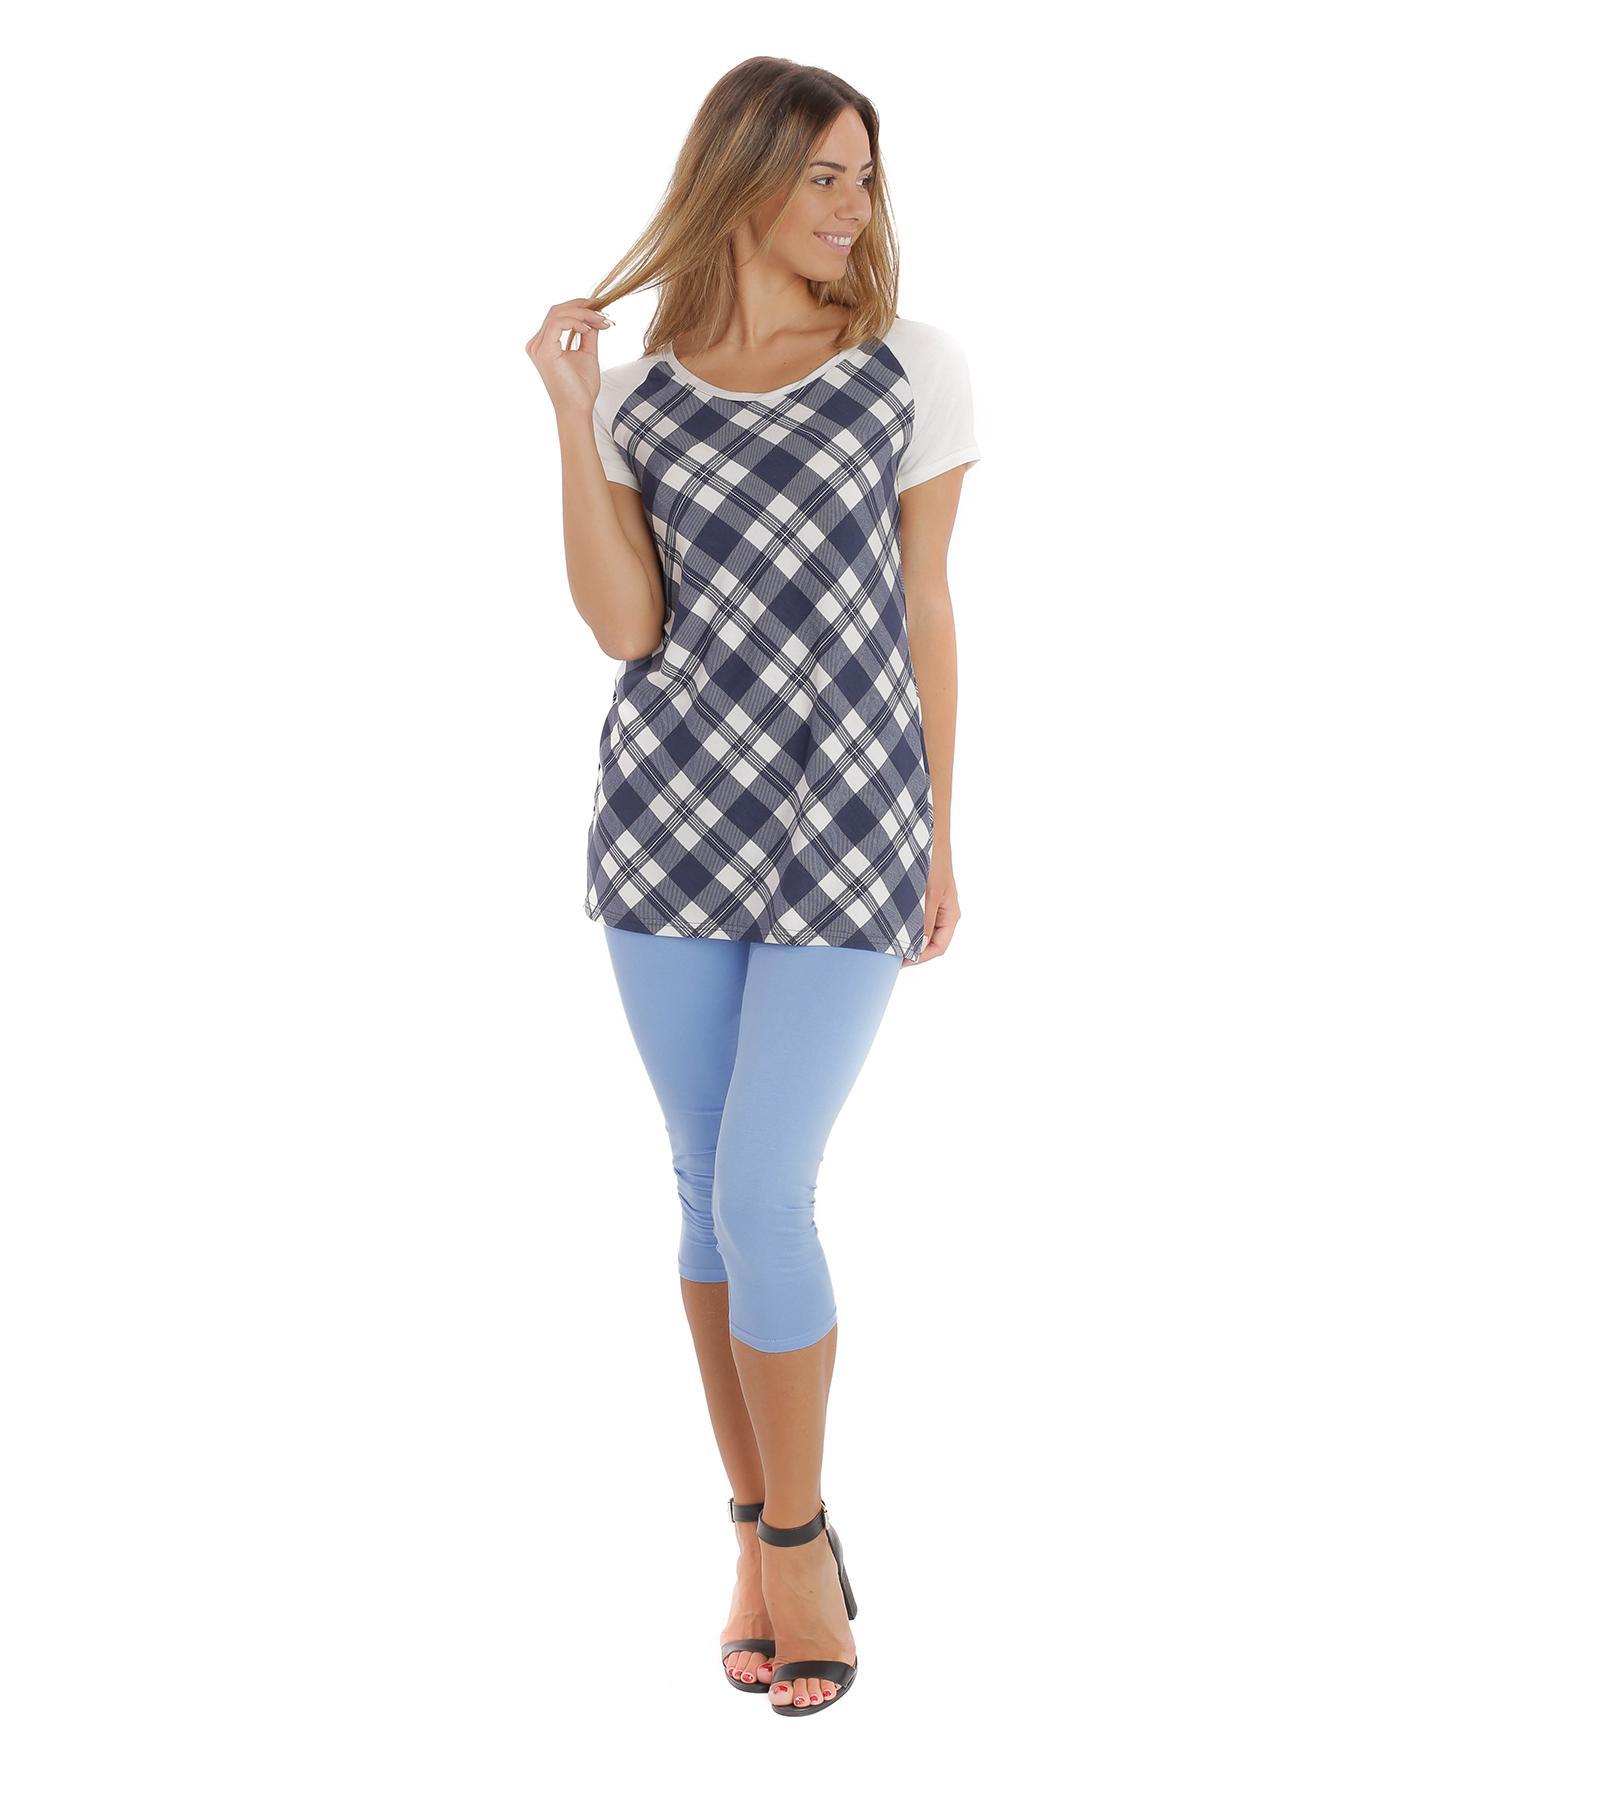 Niebieskie legginsy do łydek Bensini®